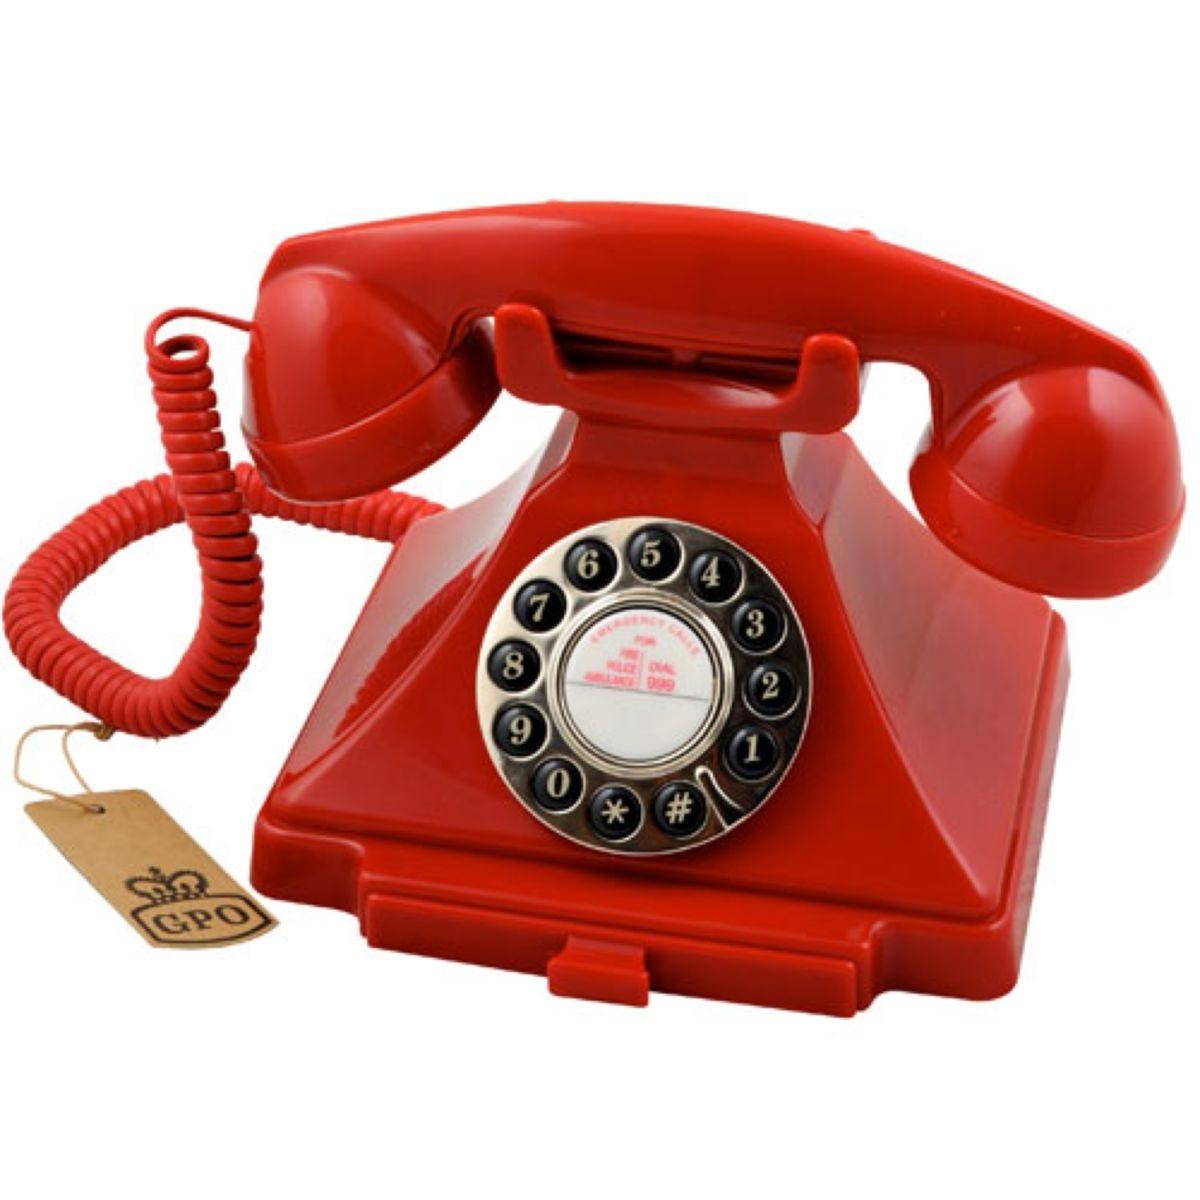 GPO Carrington Nostalgic Design Telephone - Red